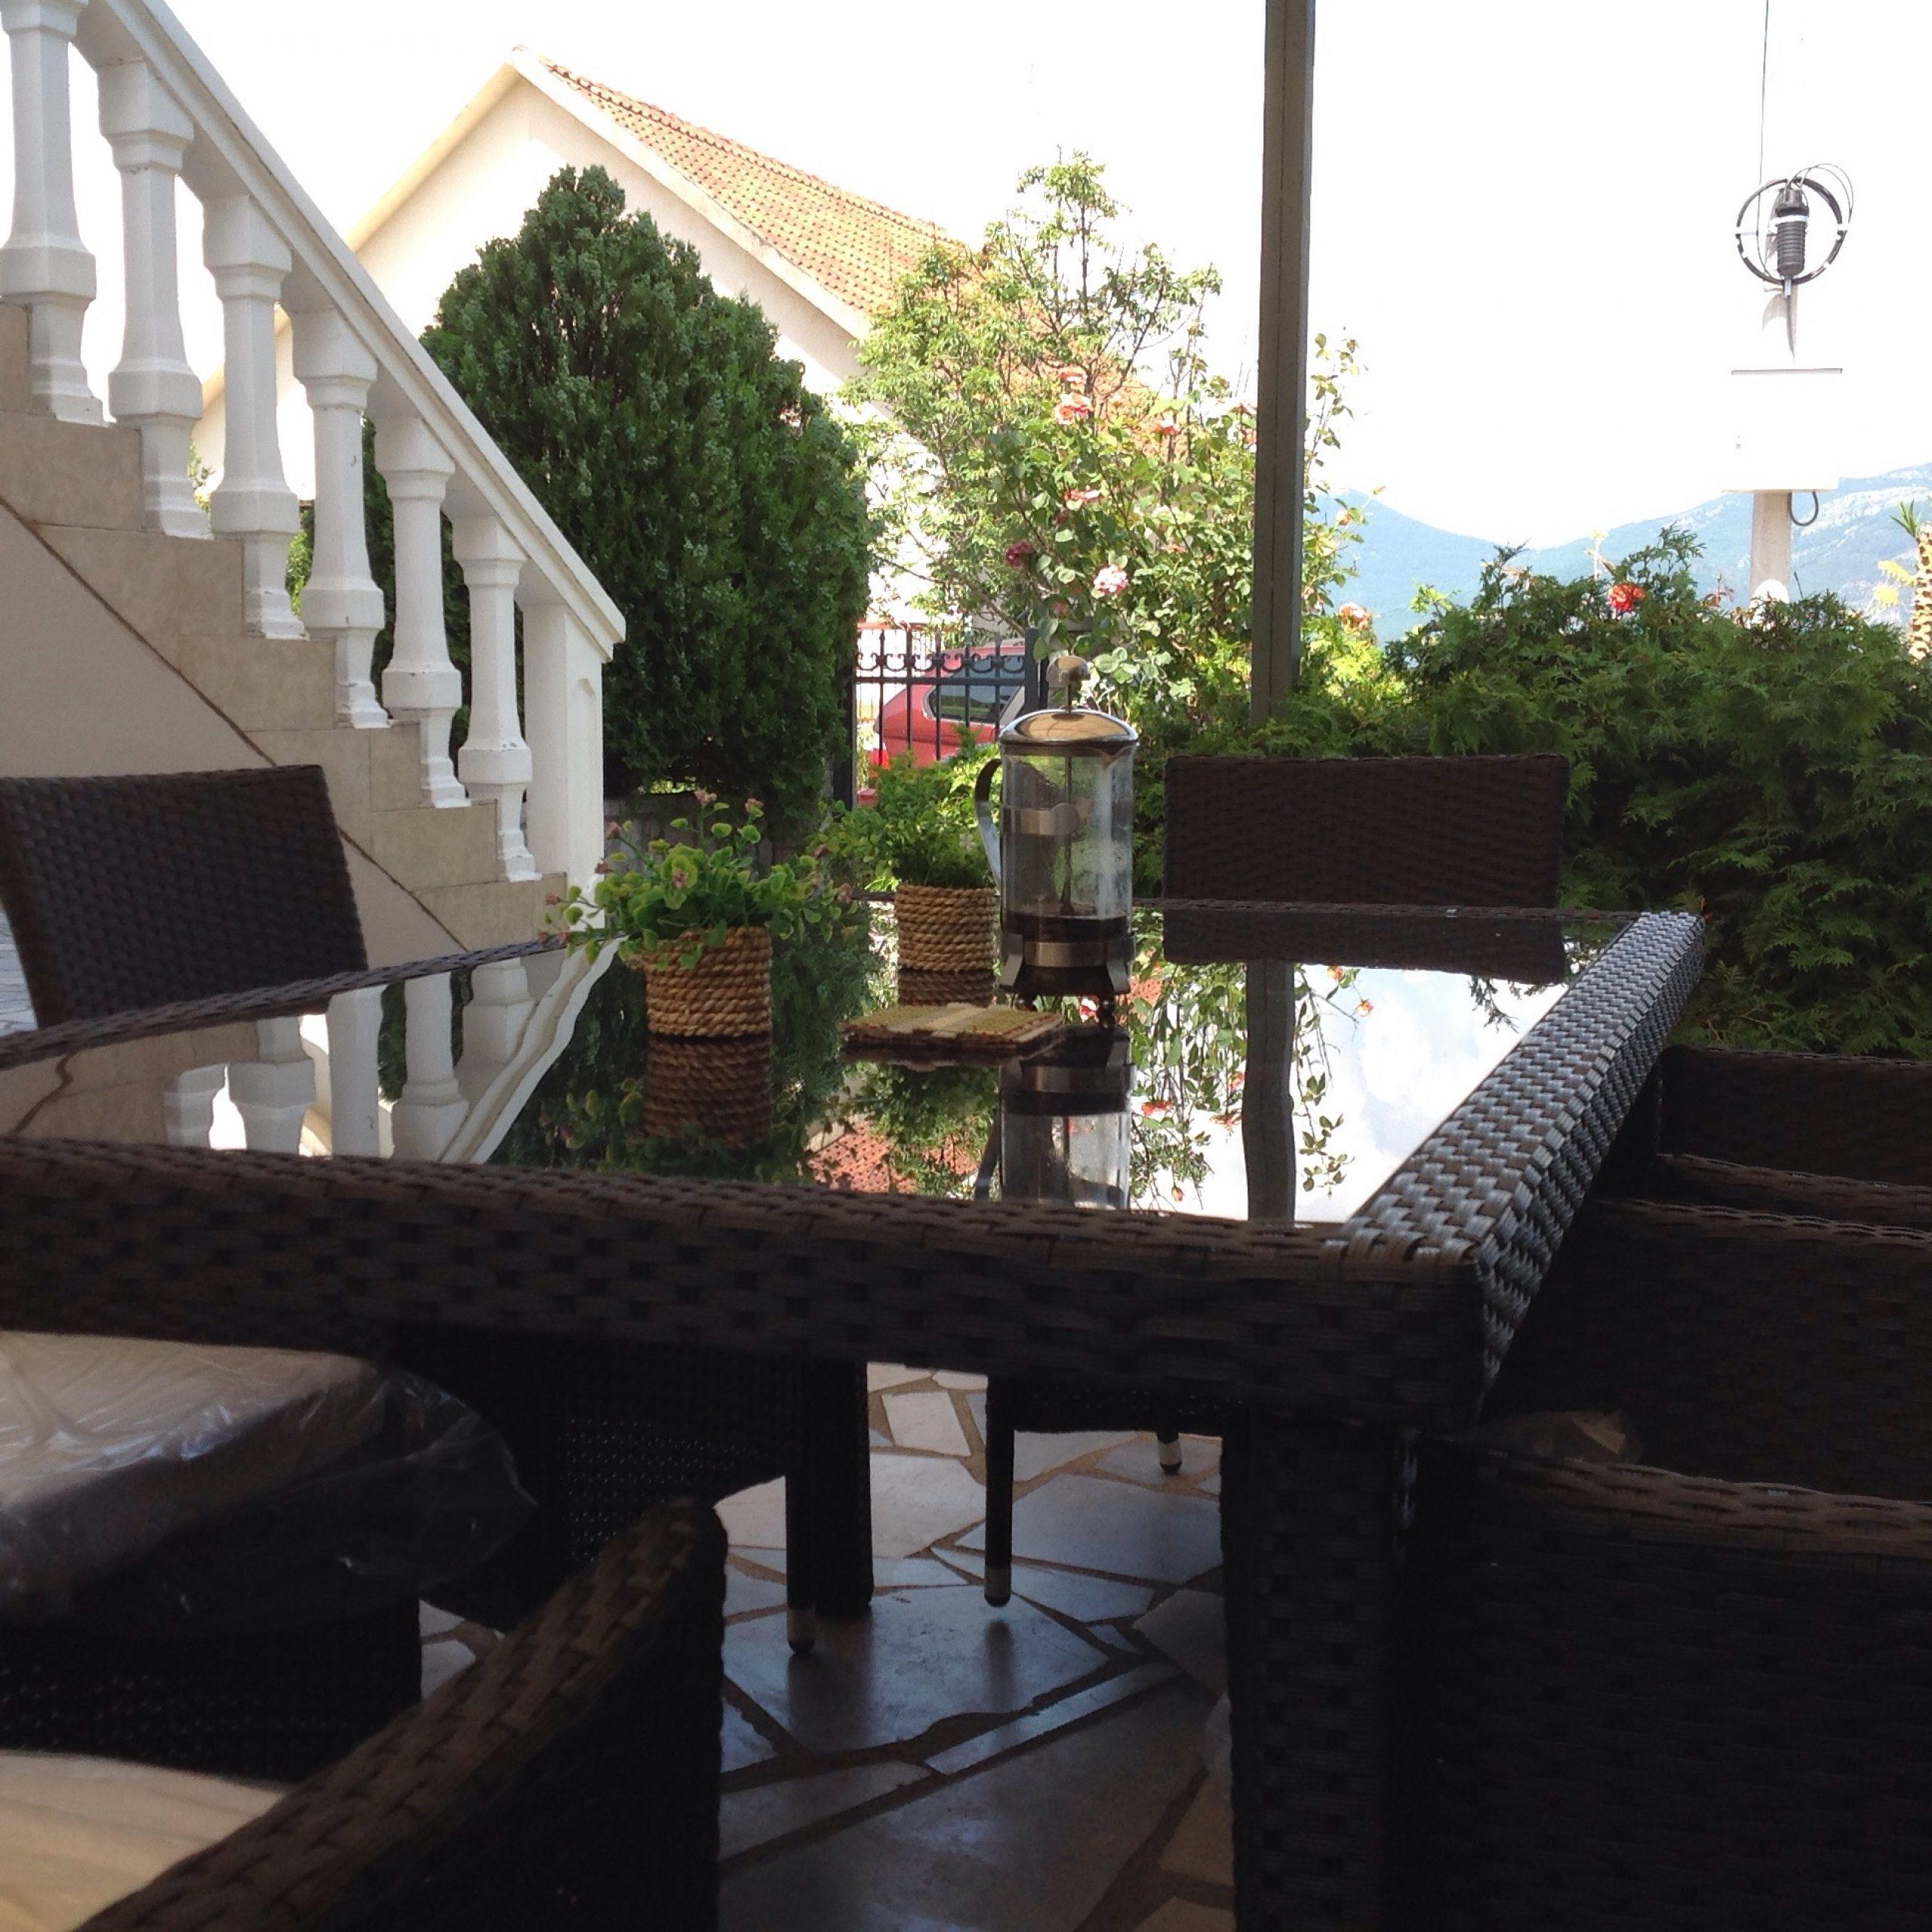 Bella Vista Apartments - Coffe terrace - Letsgotomontenegro